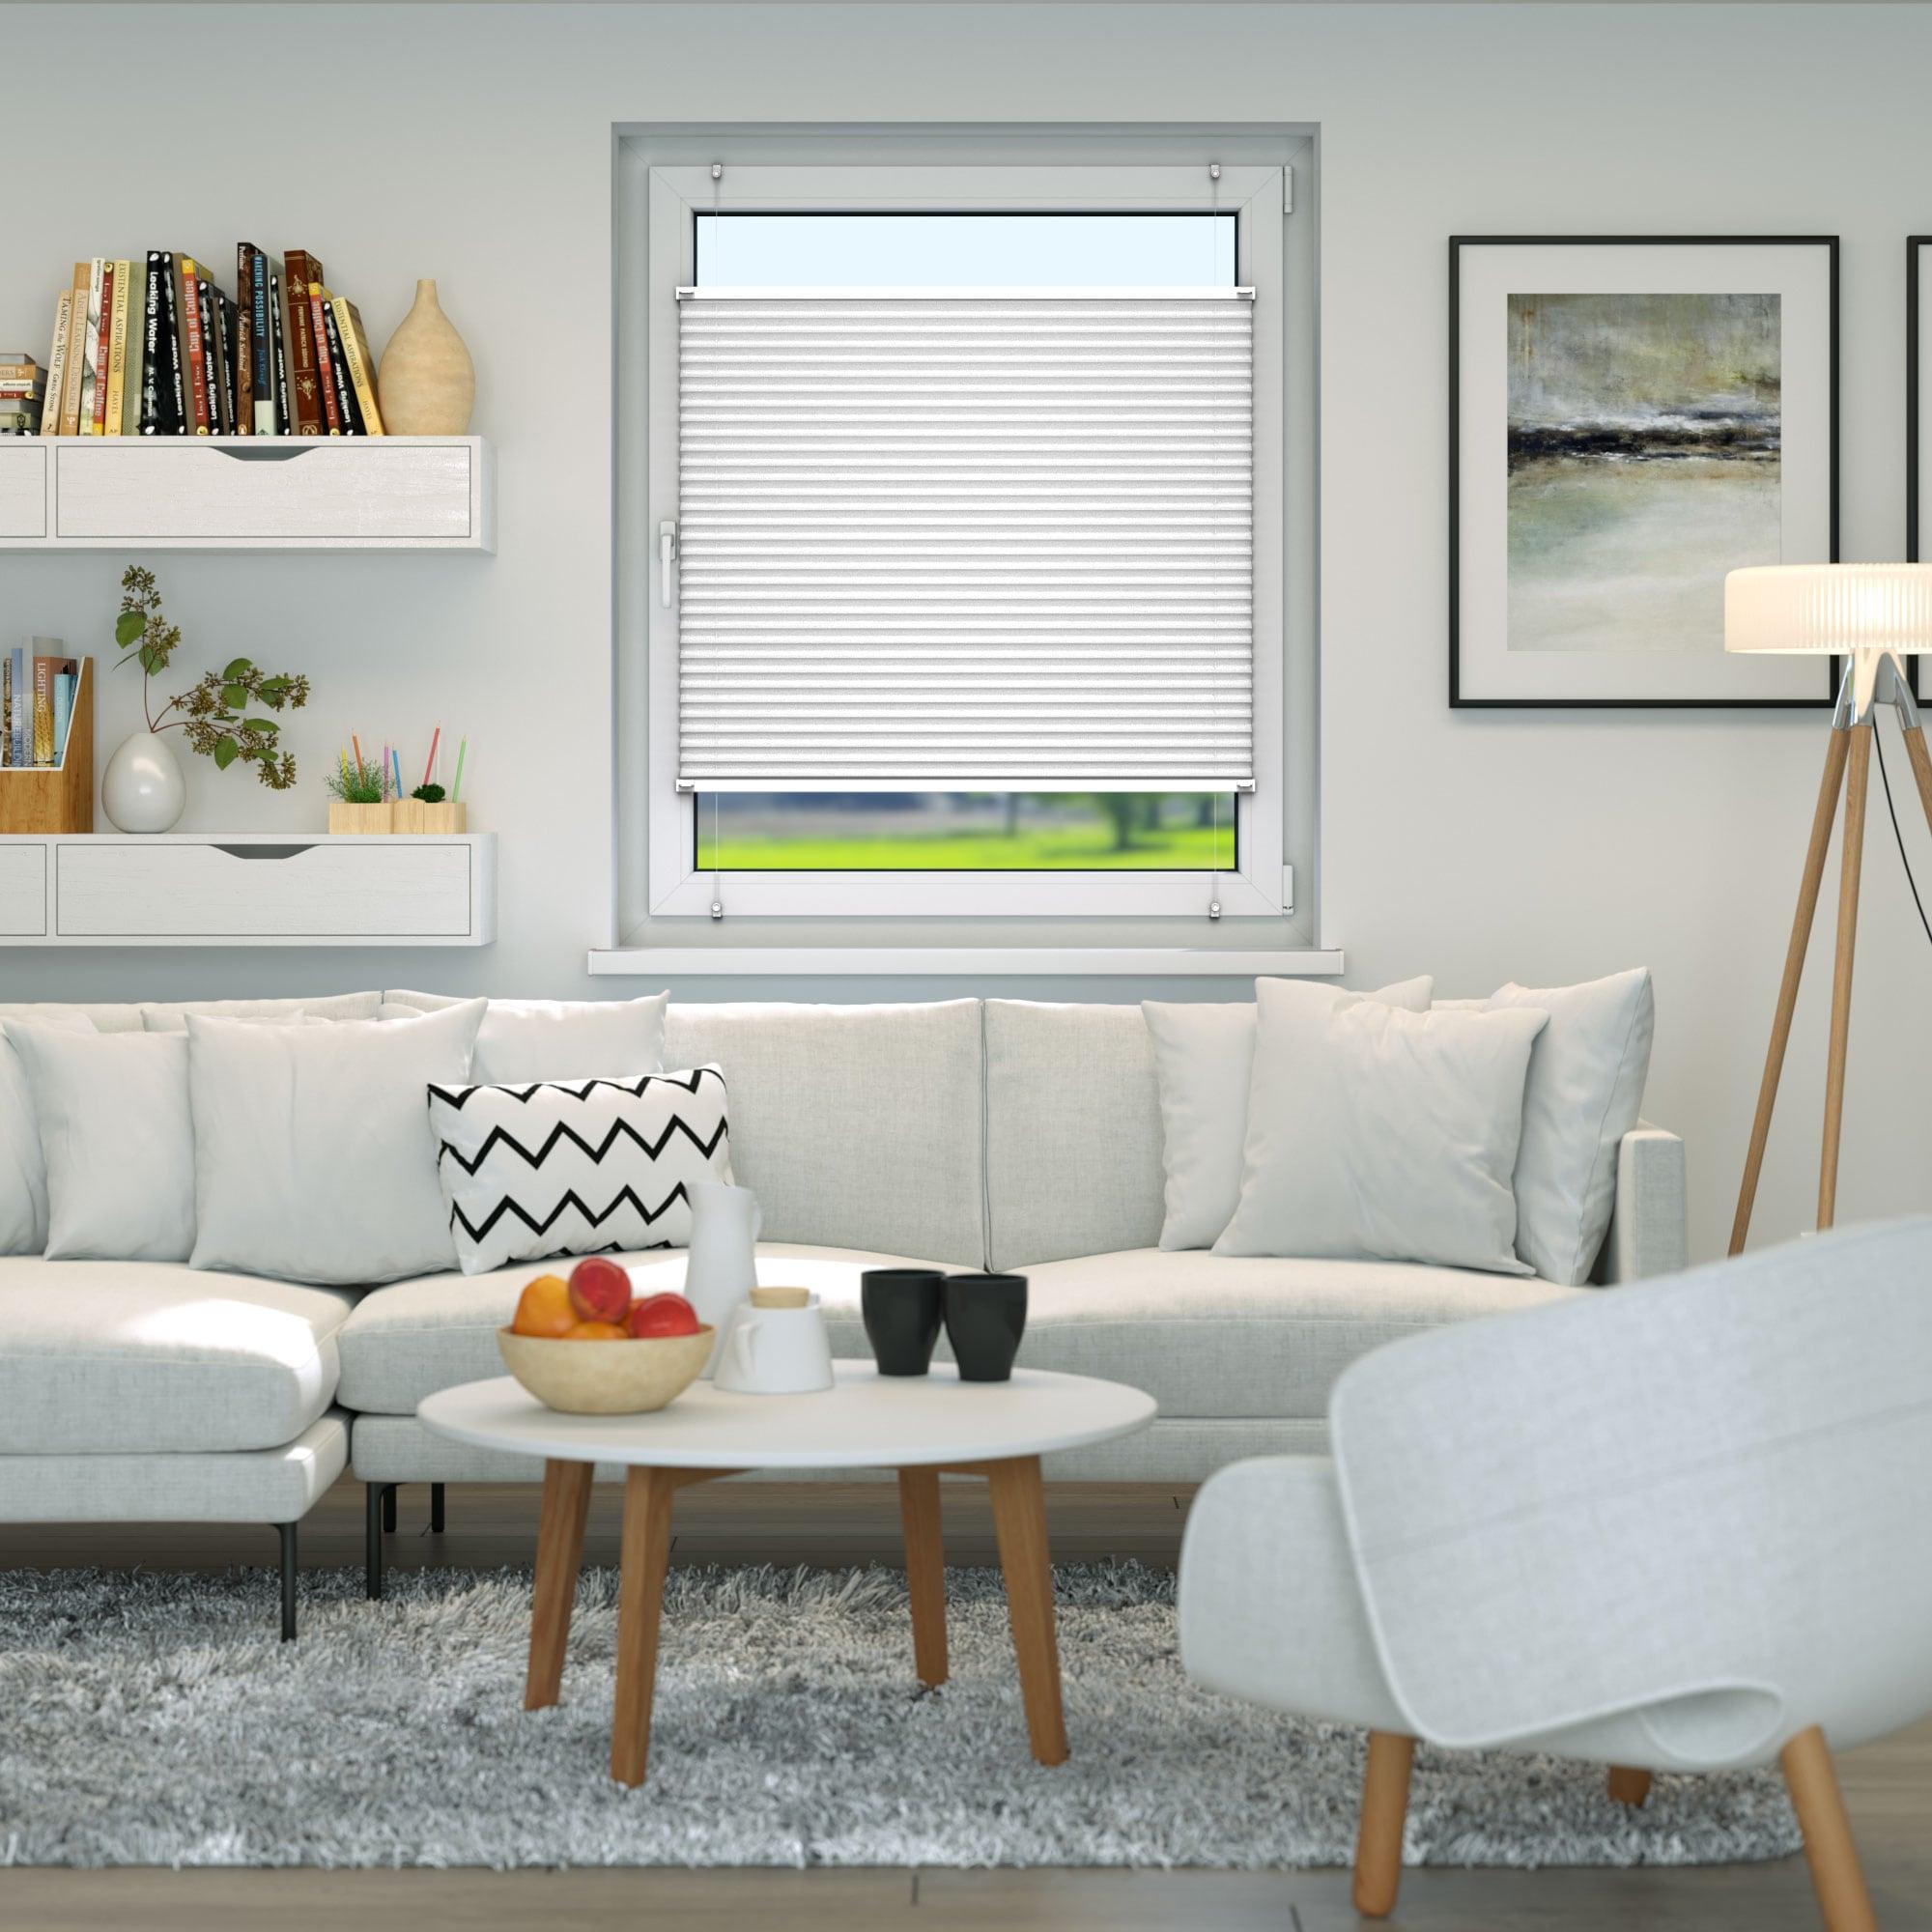 Klemmfix-Plissee-Faltrollo-ohne-Bohren-Fenster-Tuer-Plisseerollo-Plisee-Easyfix Indexbild 22